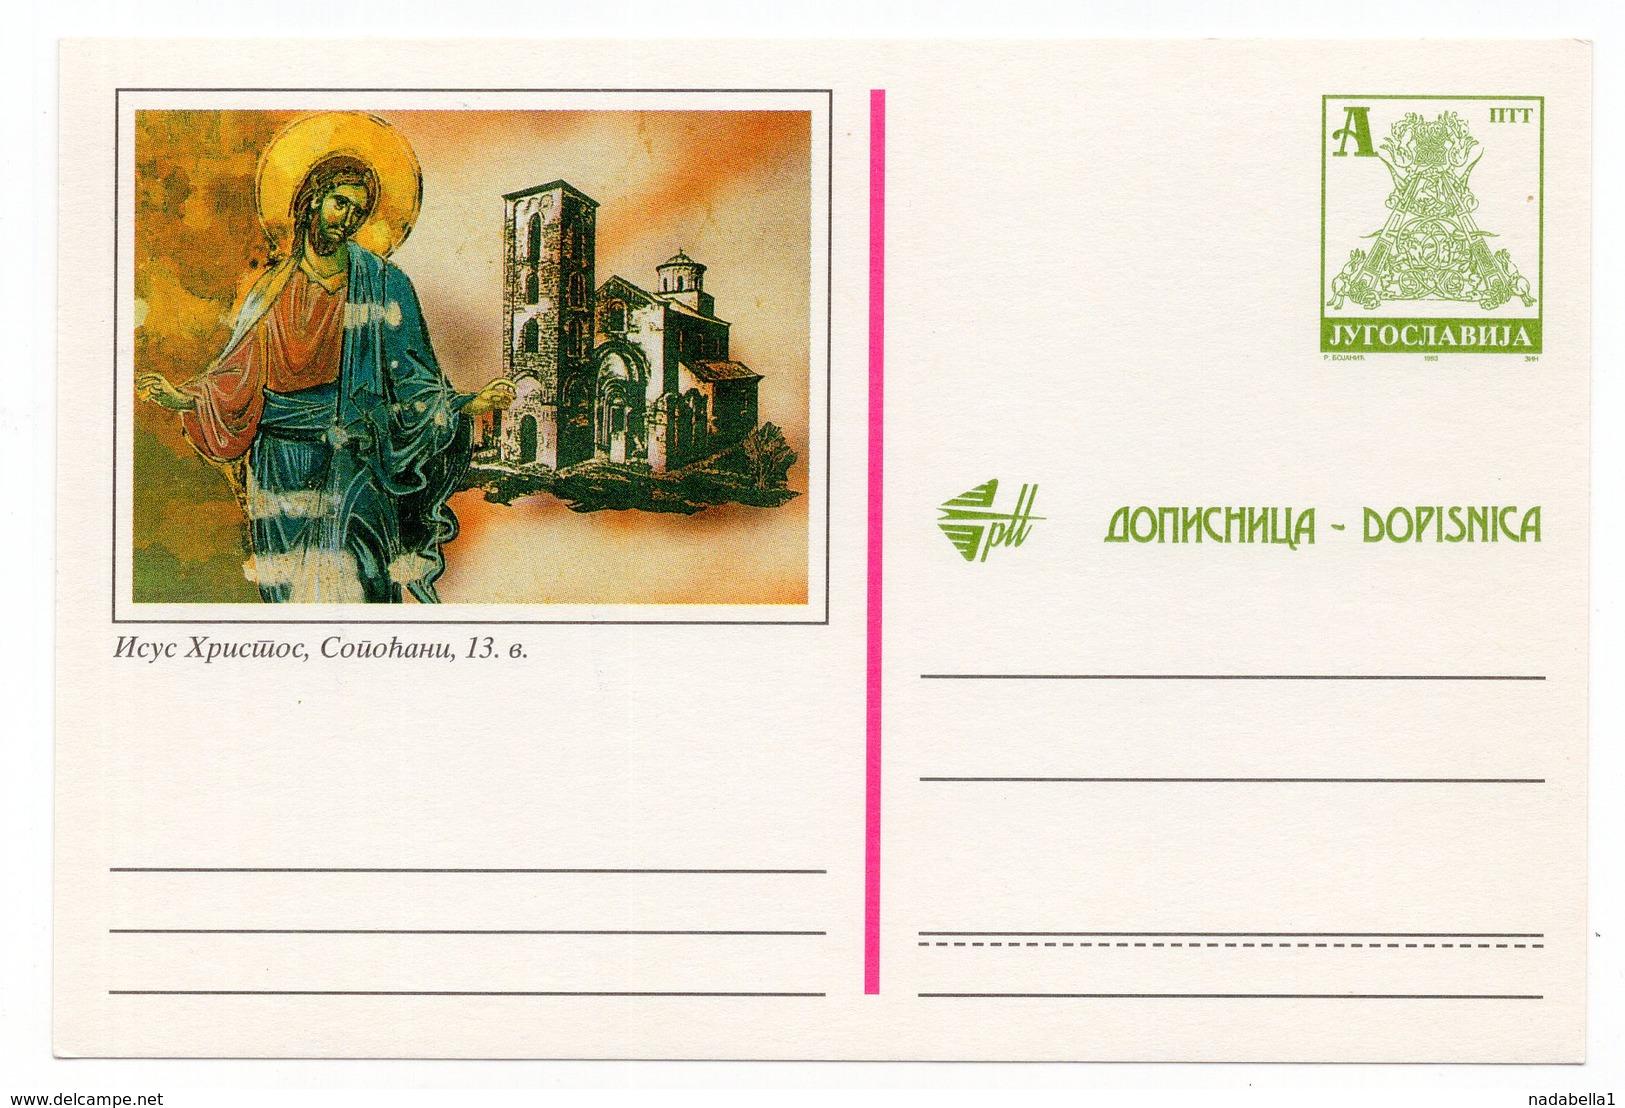 1983 YUGOSLAVIA, SOPOCANI, JESUS CHRIST, FRESCO, MONASTERY, ILLUSTRATED STATIONERY CARD, MINT - Entiers Postaux